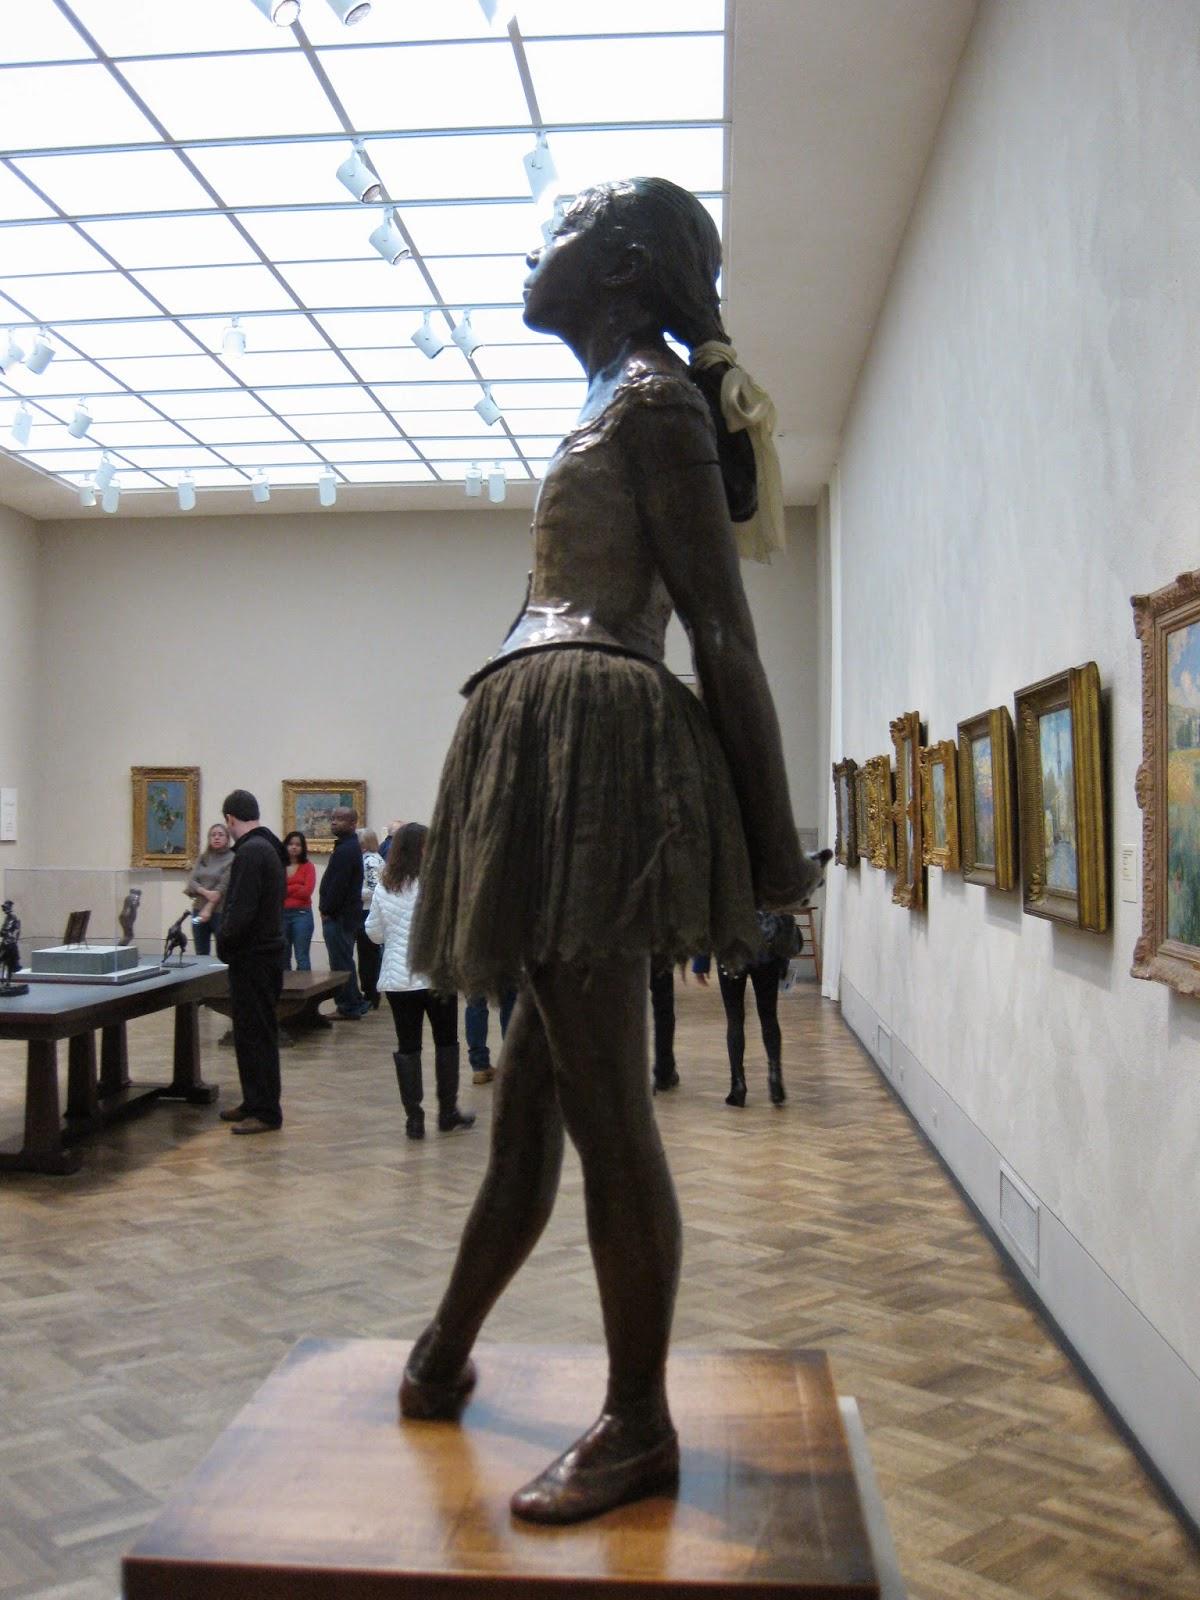 Degas ballerina statue, Philadelphia Museum of Art